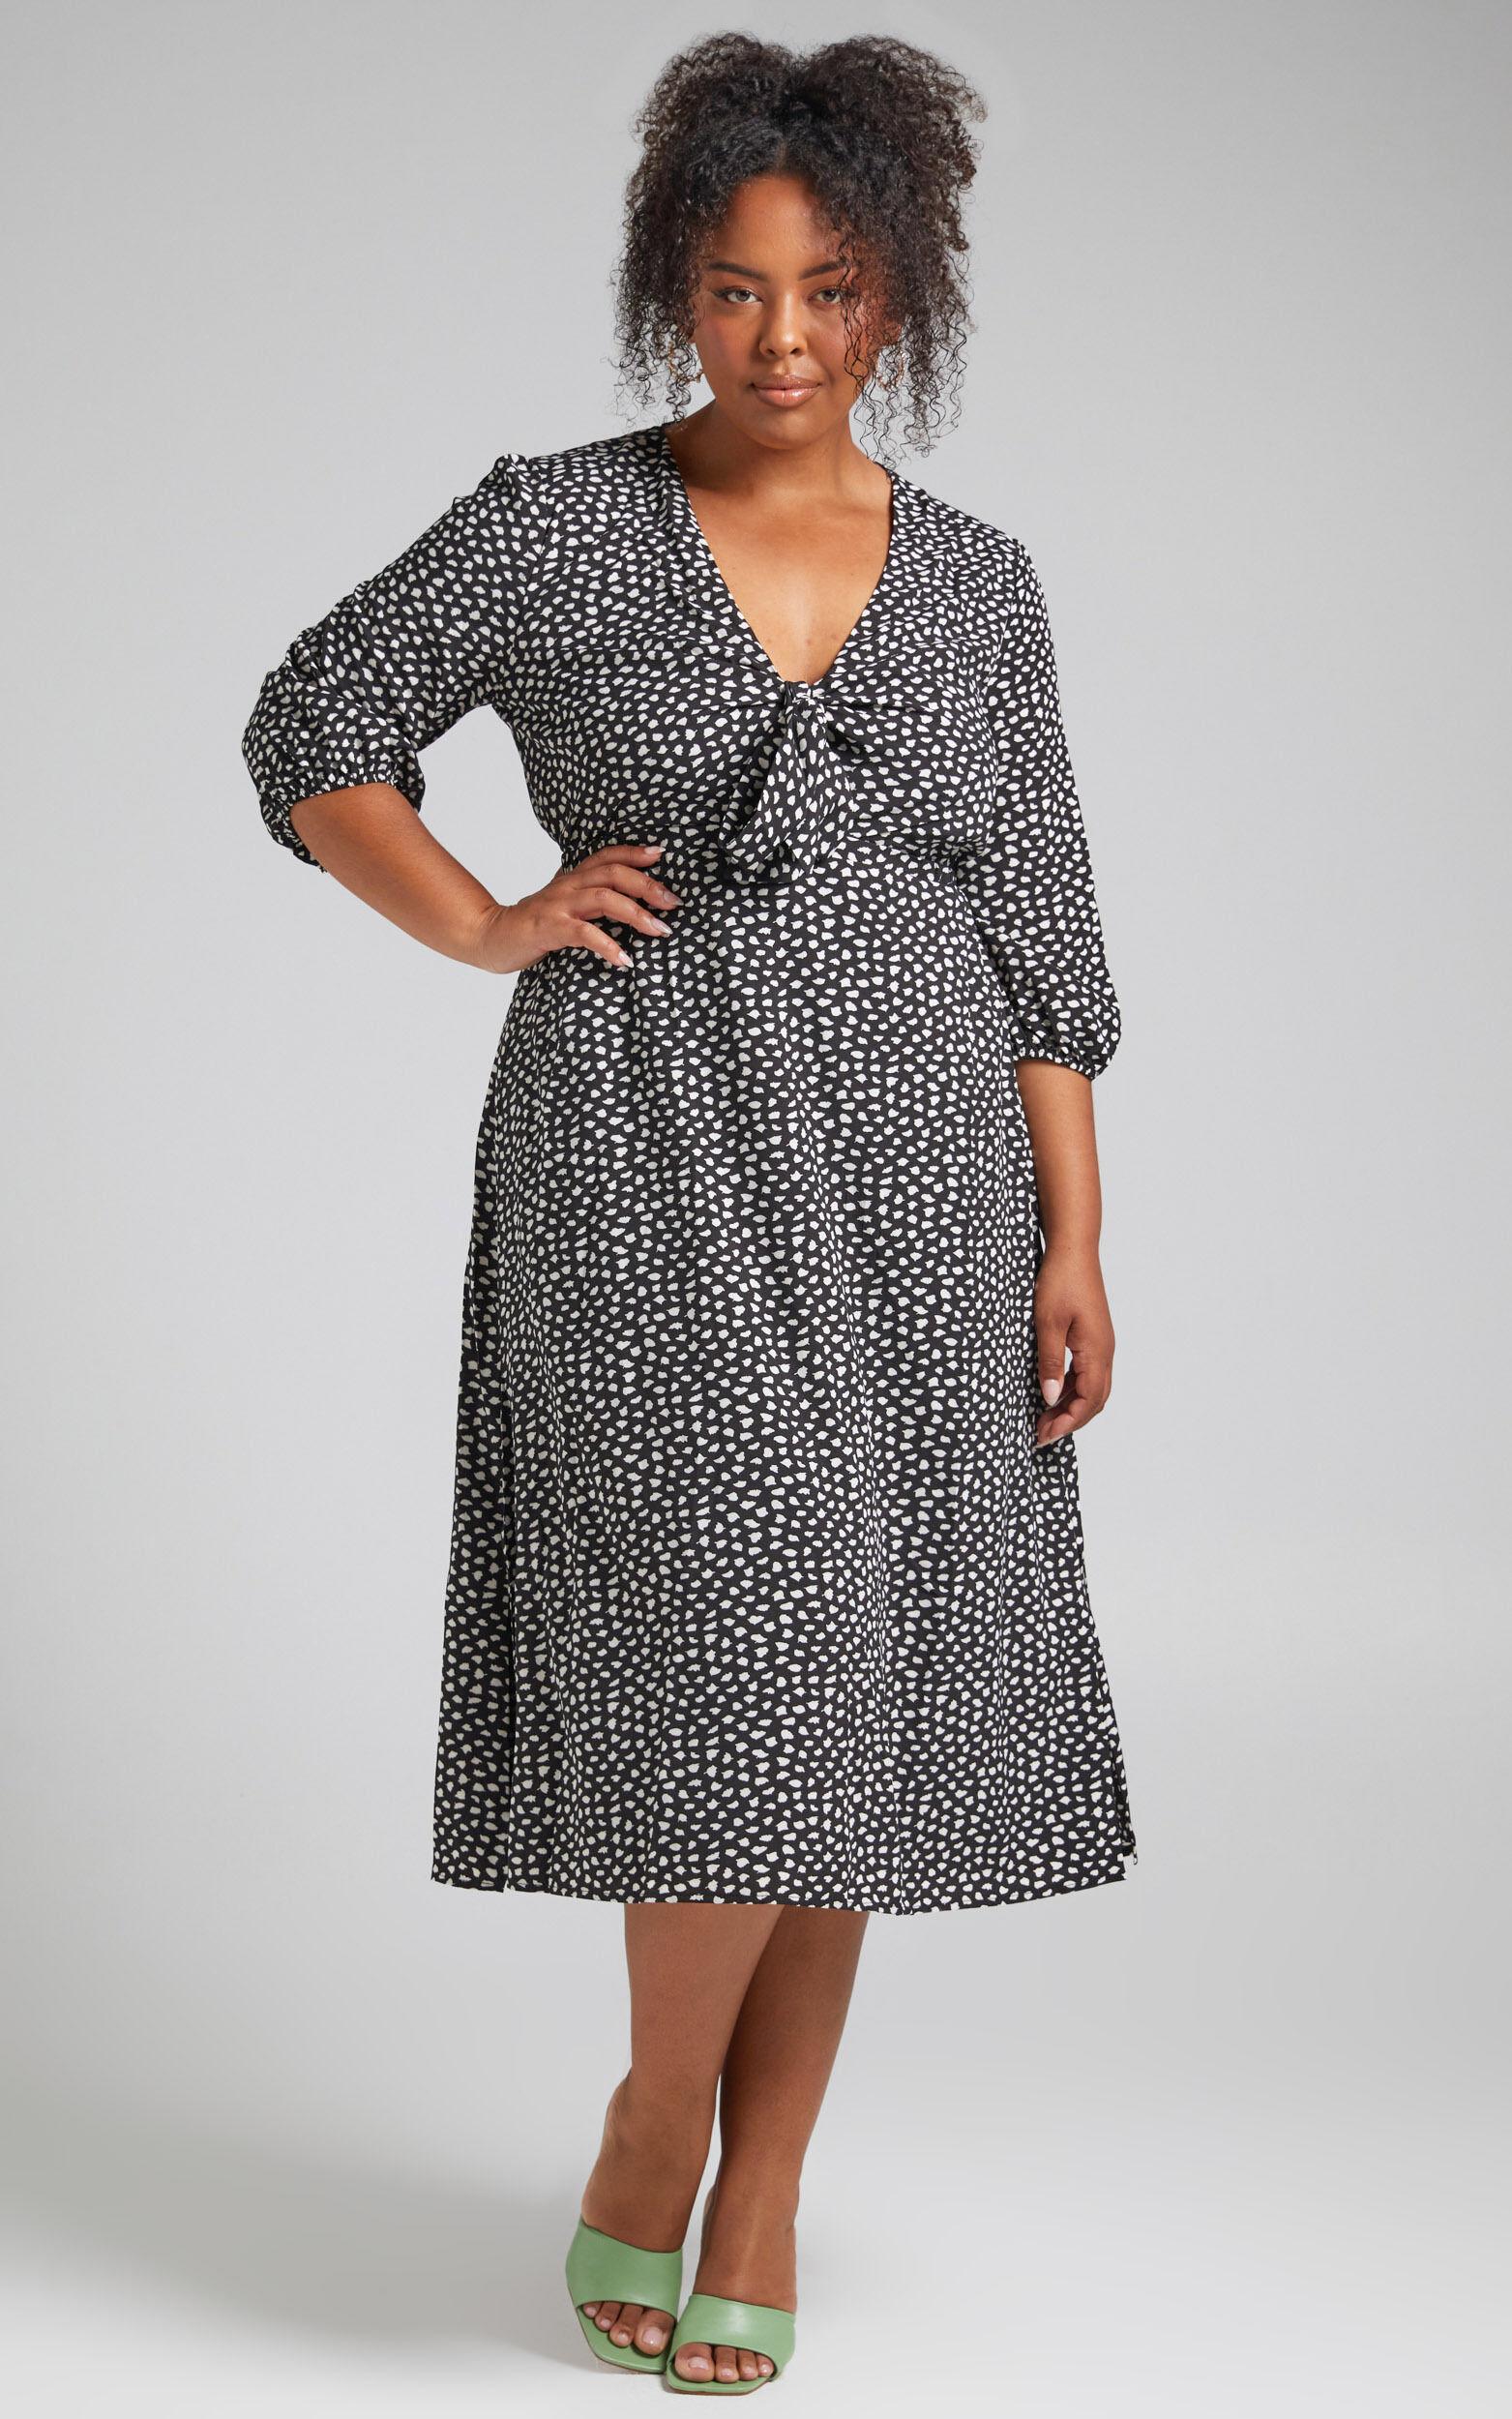 Kini Midi Centre Front Neckline Dress in Black Spot - 04, BLK1, super-hi-res image number null